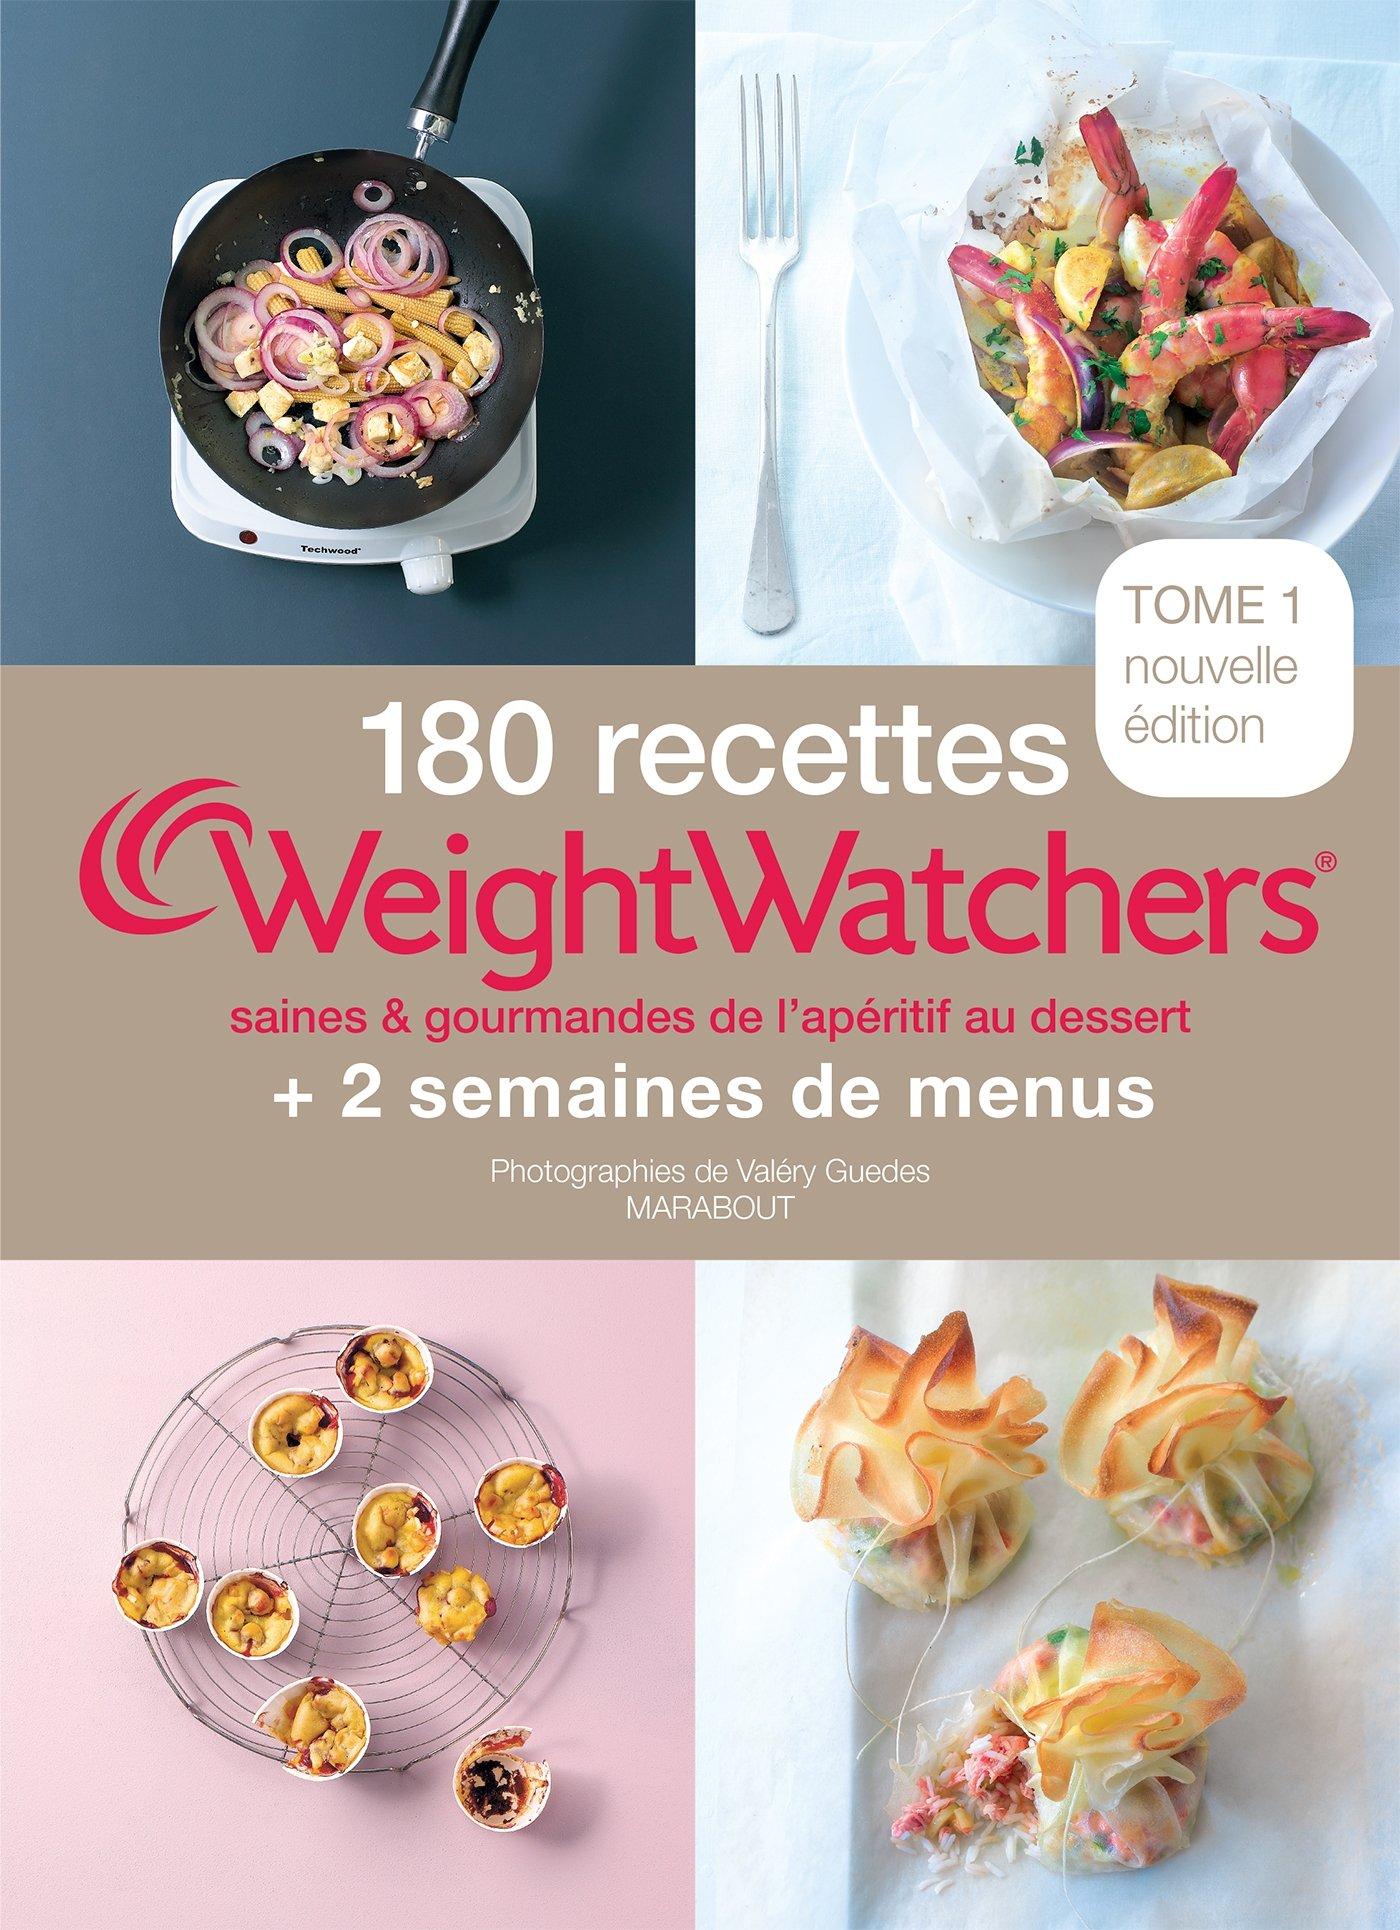 Menu De Noel Weight Watchers.180 Recettes Weight Watchers Tome 1 Saines Et Gourmande